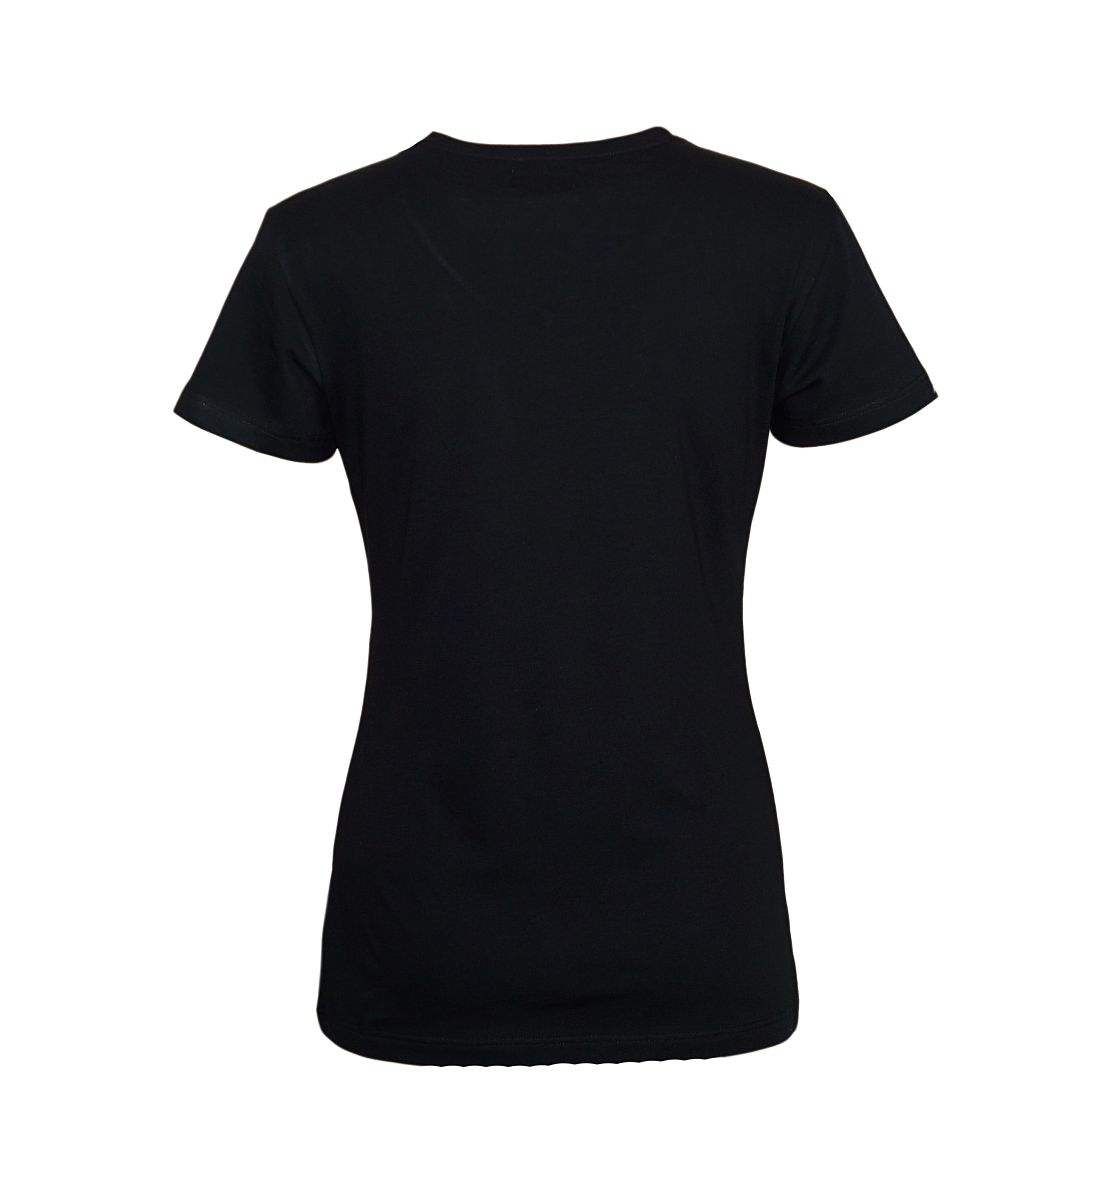 Emporio Armani Damen Shirt T-Shirt Rundhals 163139 7A317 00020 NERO HW17-EADS1